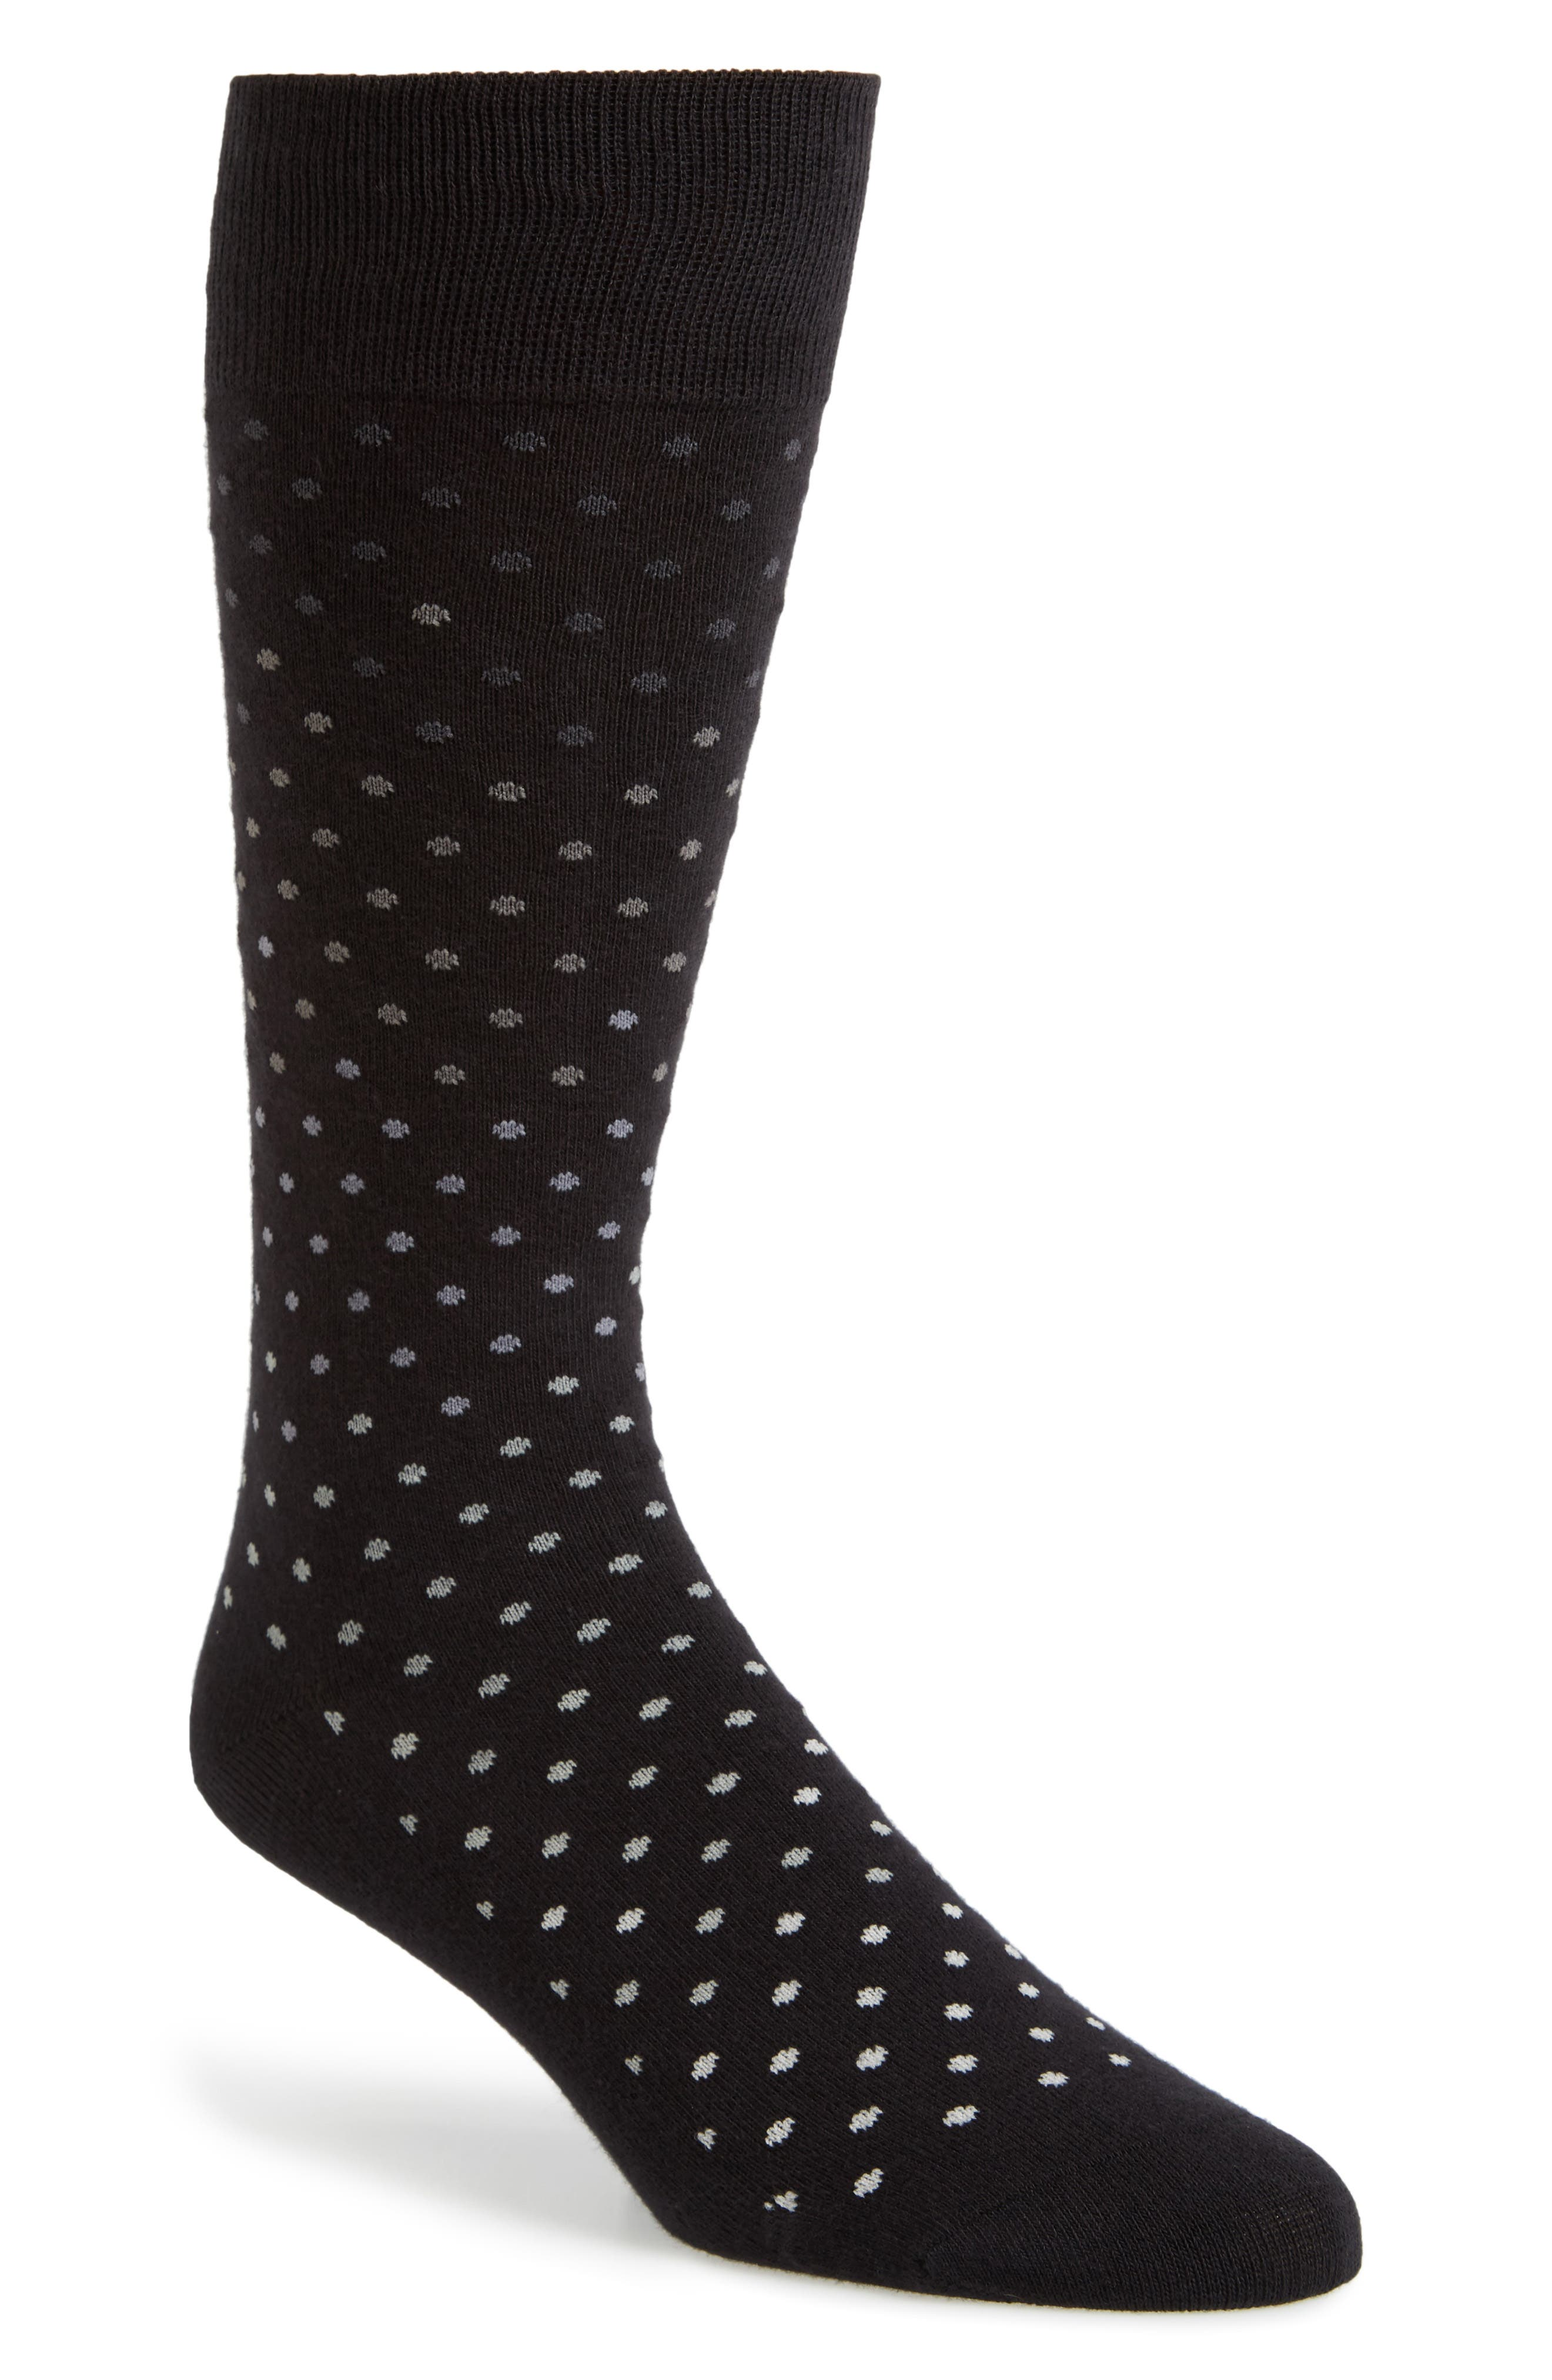 Alternate Image 1 Selected - Calibrate Dot Socks (3 for $30)